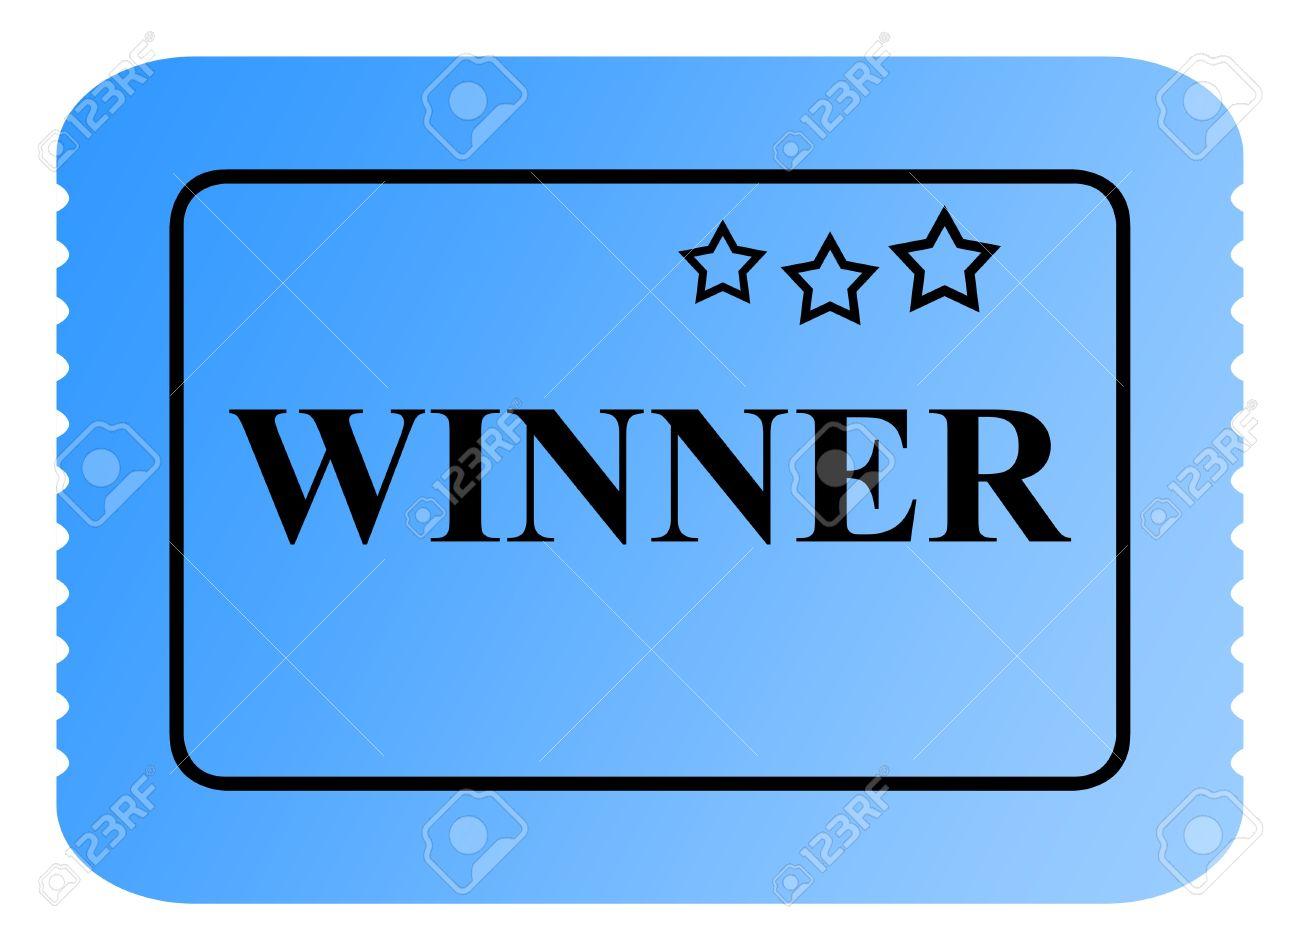 Winning clipart lottery winner Ticket  Lottery Winning Clip